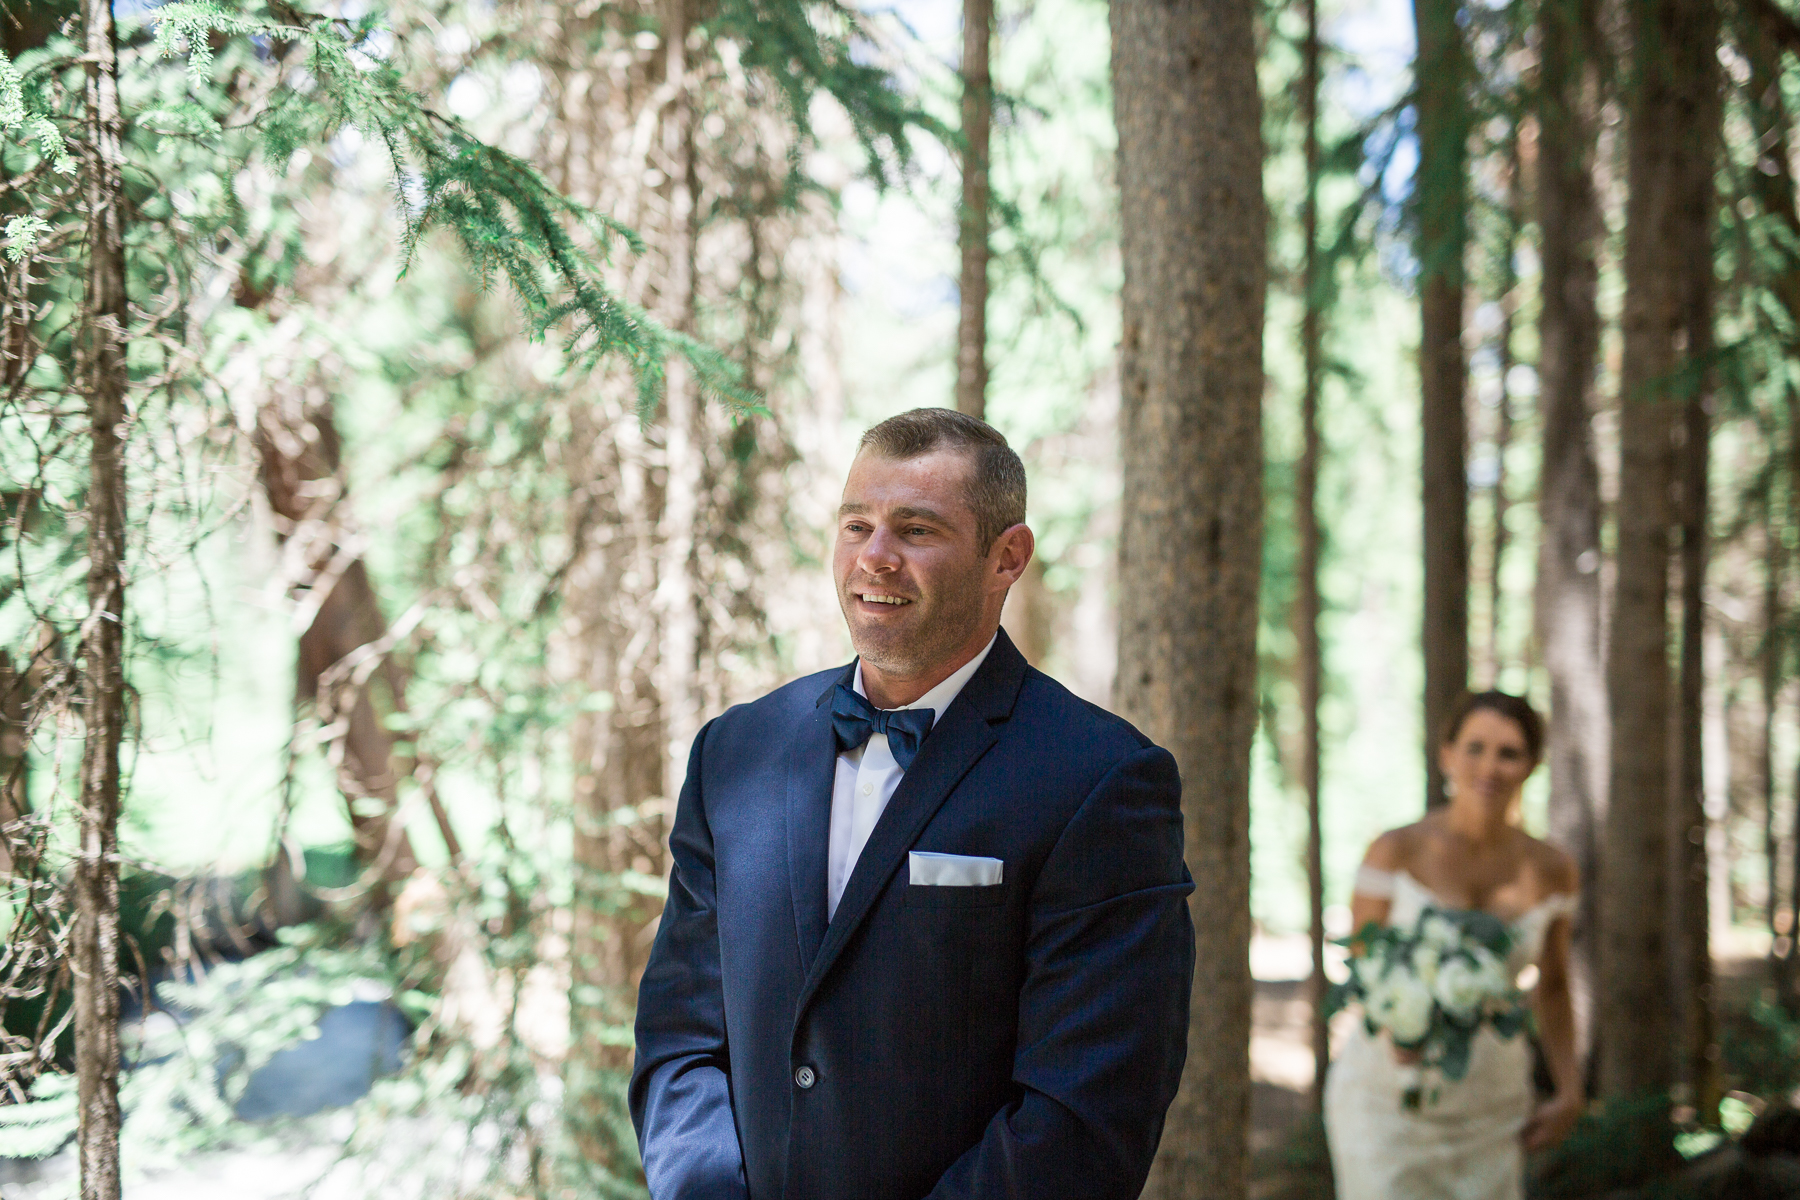 StaciDesign-Colorado-Wedding-3847.jpg